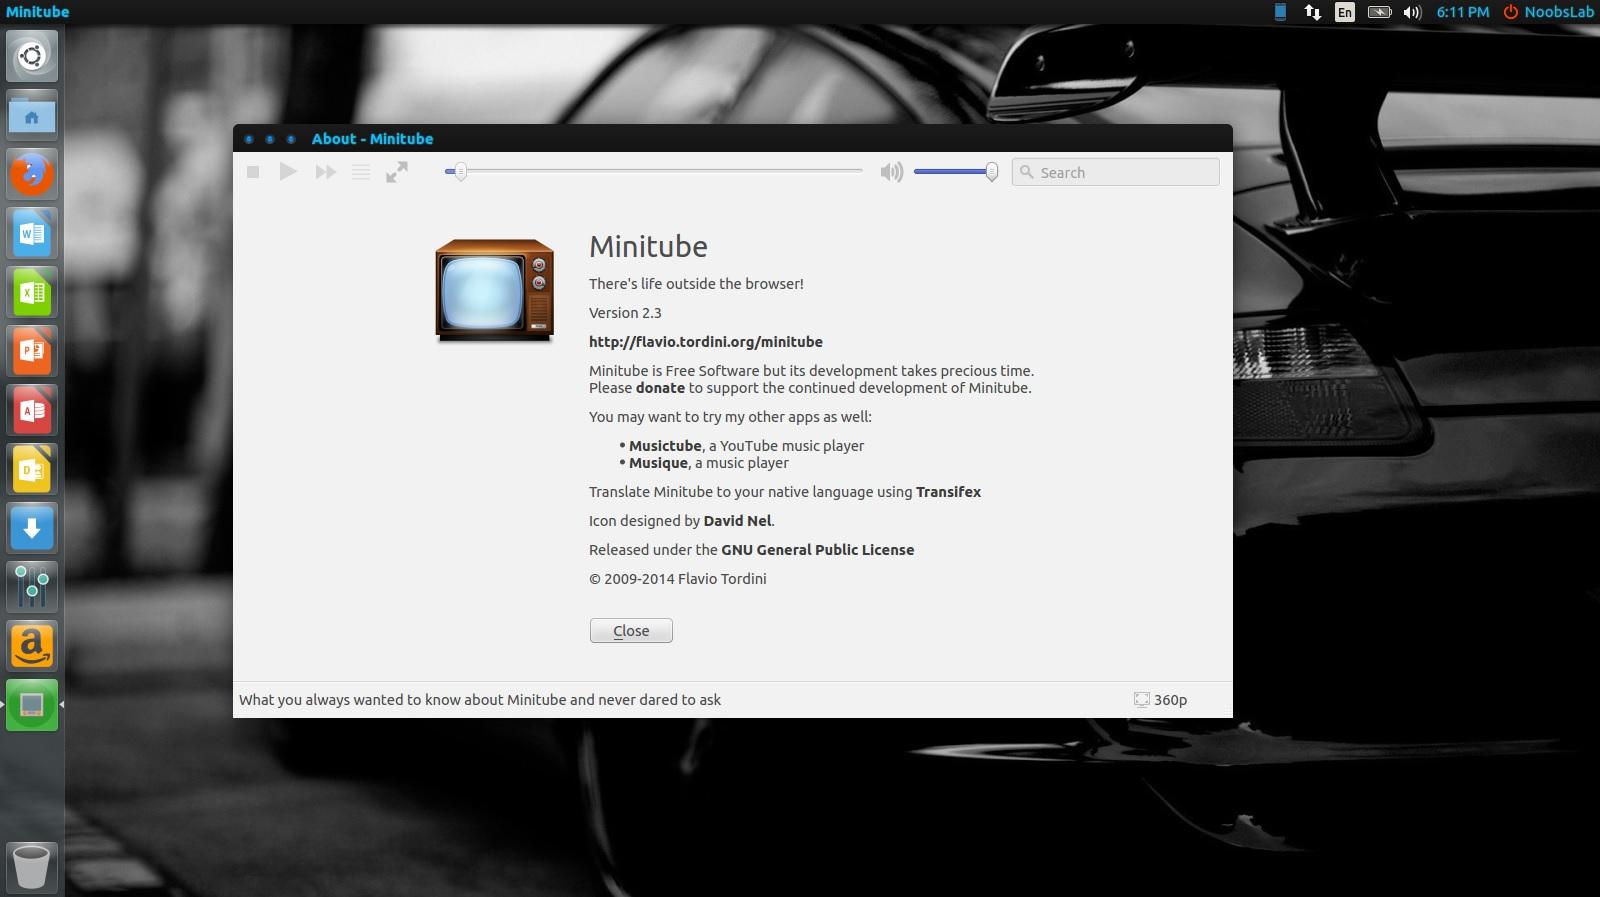 MiniTube Updated To 2.3.1 Version, Install In Ubuntu/Linux ...